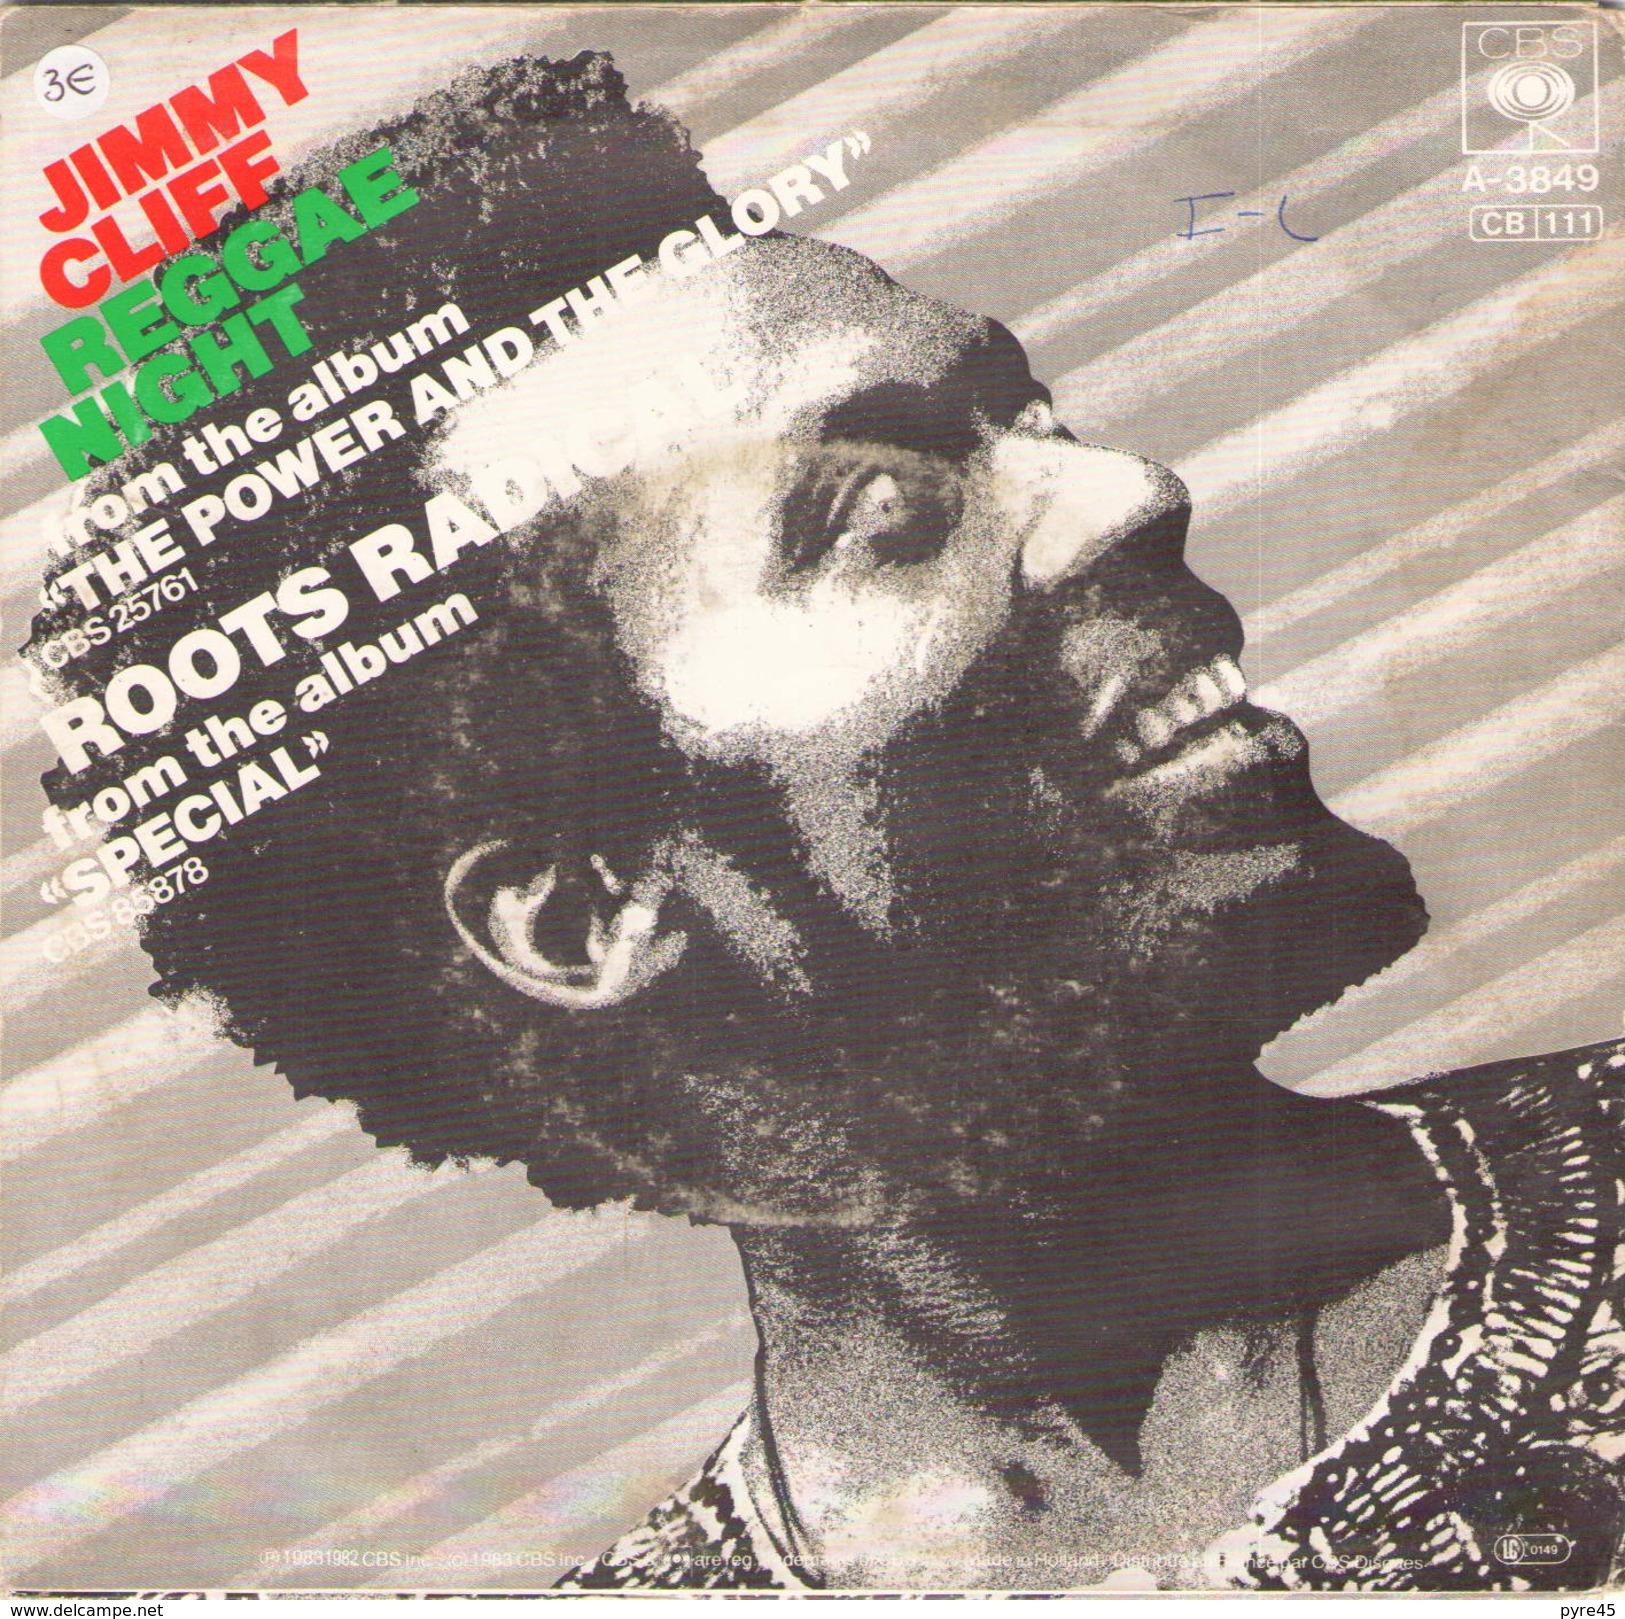 45 TOURS JIMMY CLIFF REGGAE NIGHT / ROOTS RADICAL CBS A 3849 - Reggae